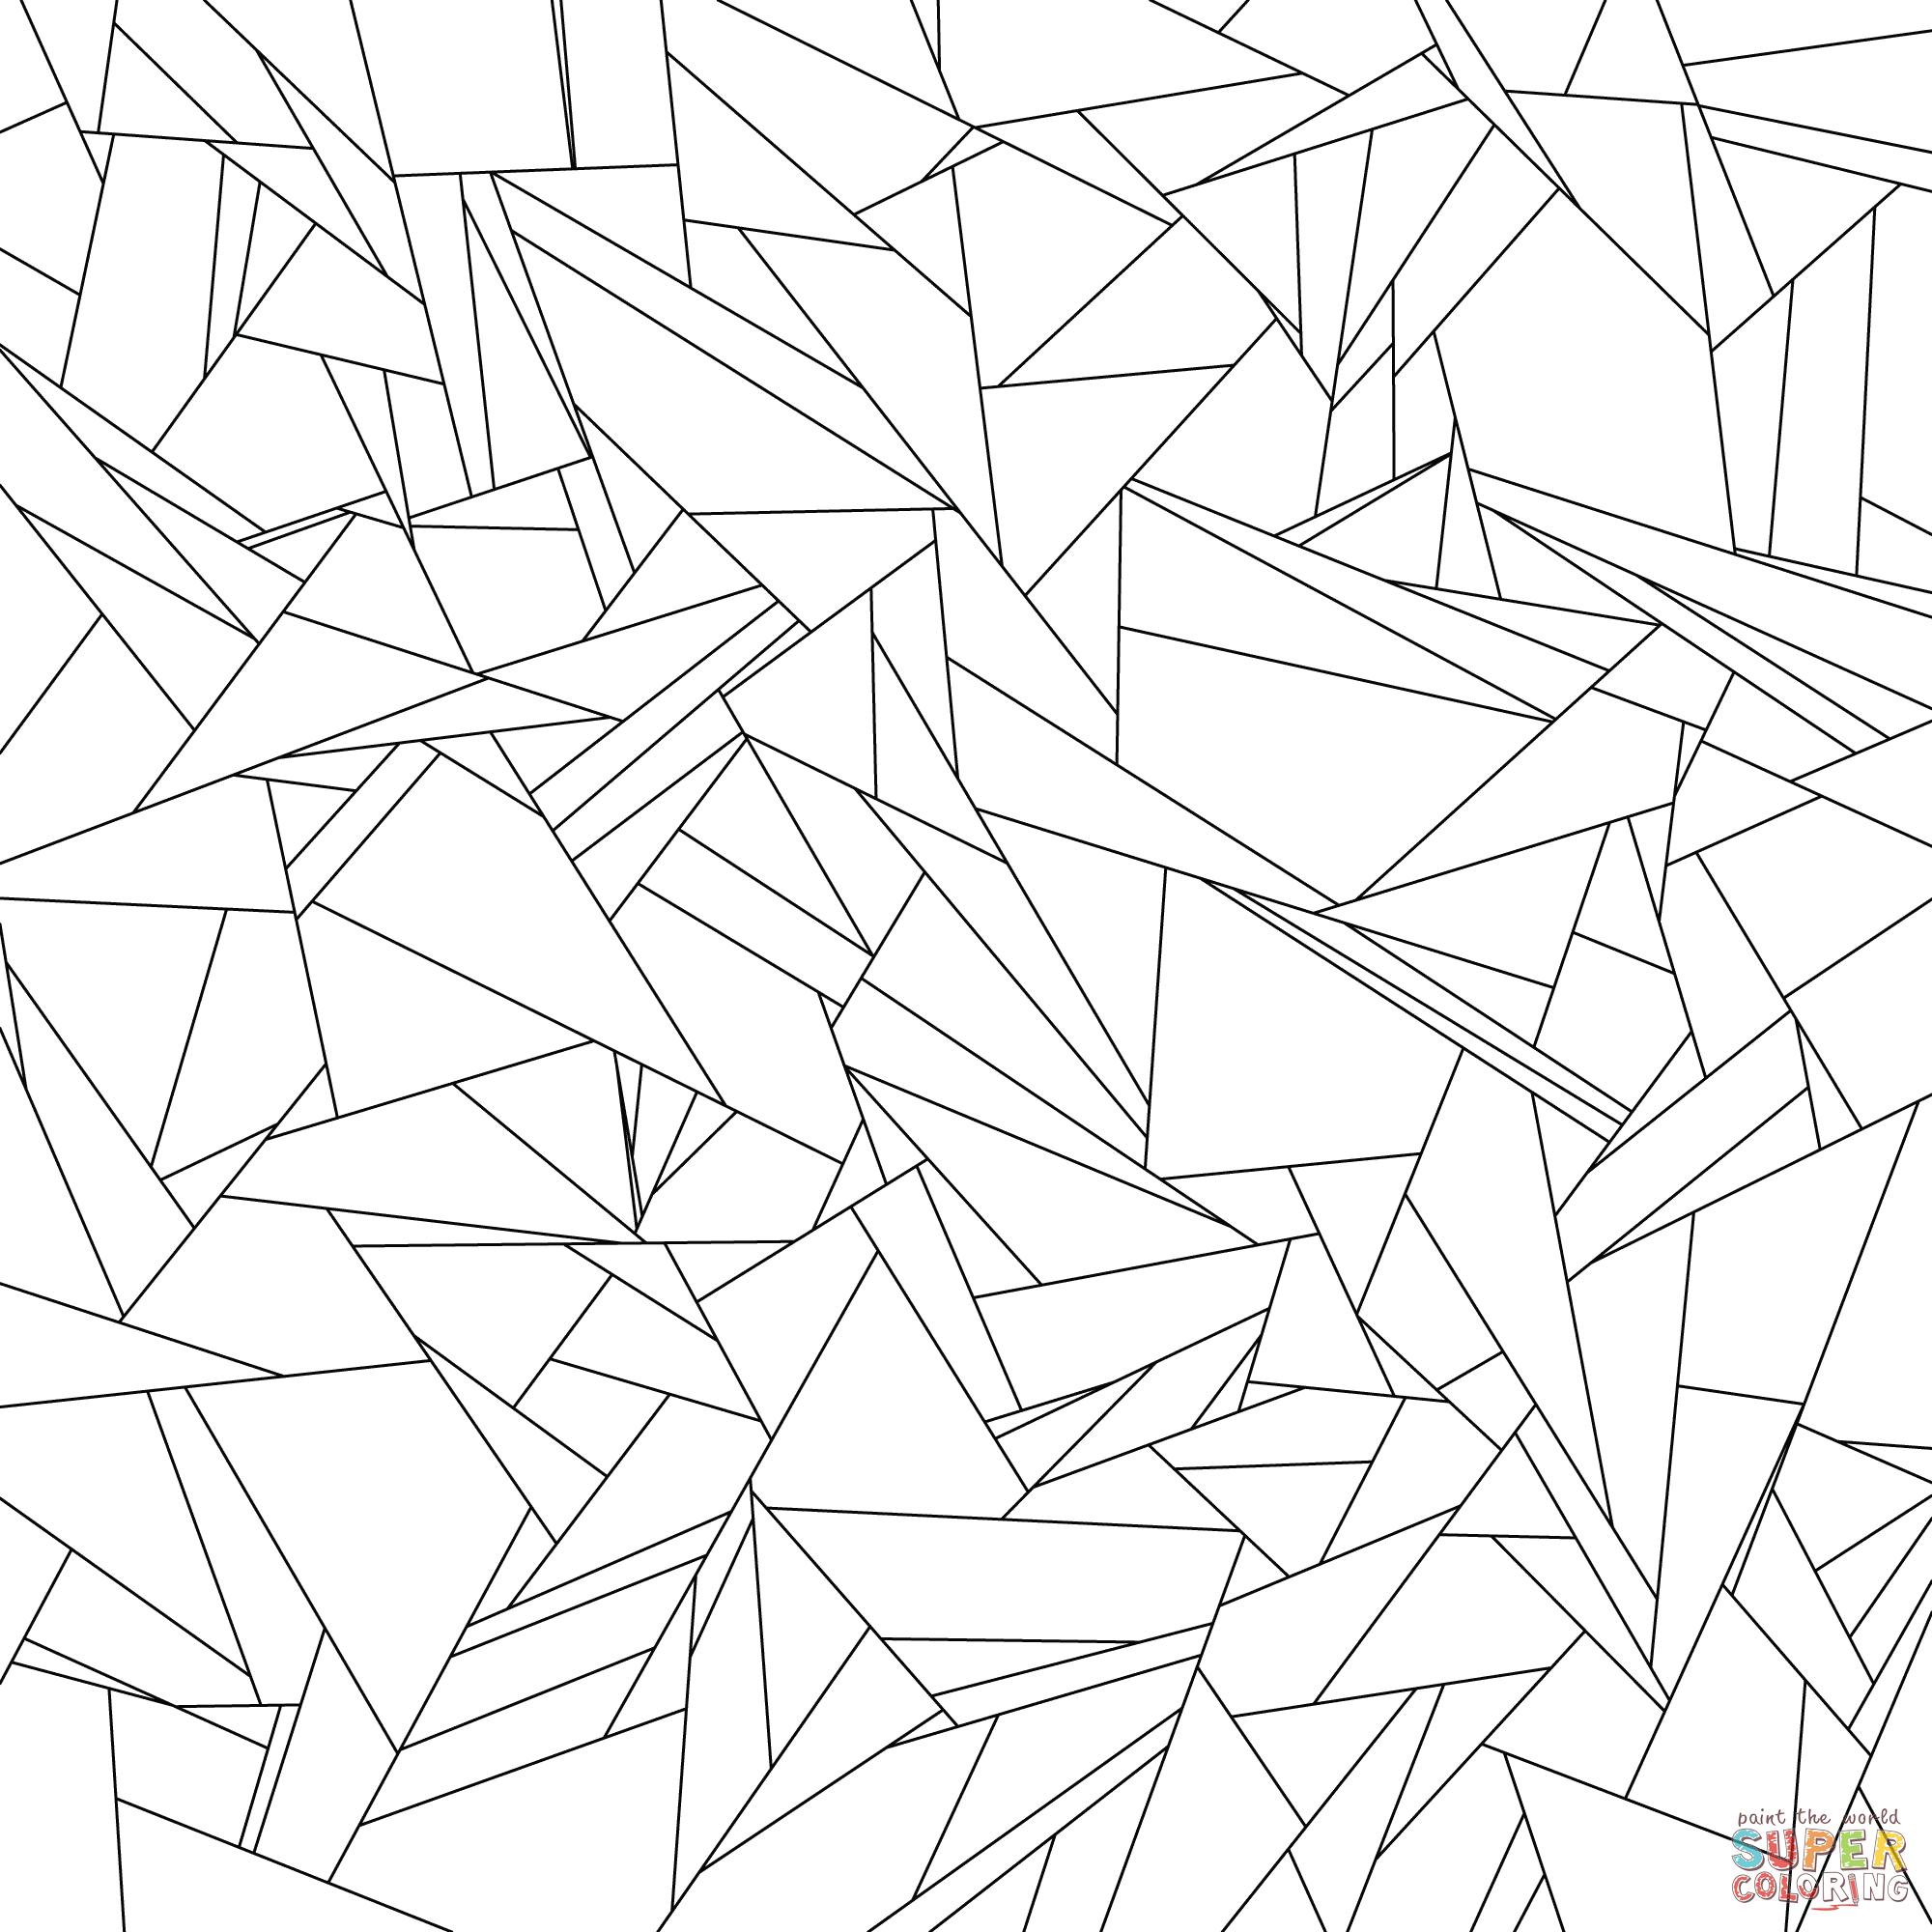 printable tessellation patterns tessellation patterns coloring pages coloring home patterns tessellation printable